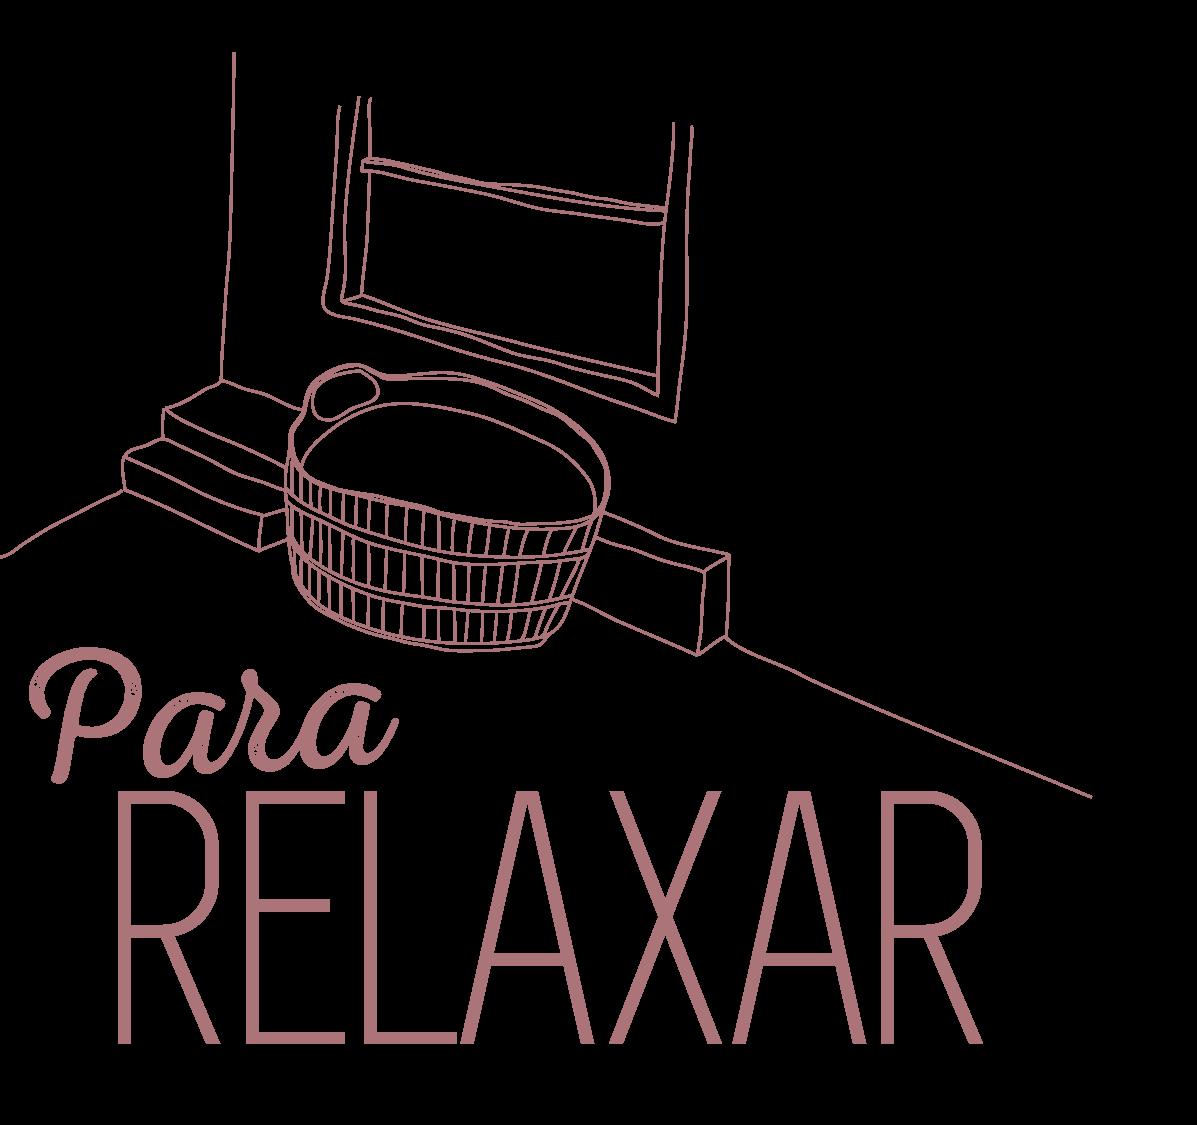 para relaxar 2.png